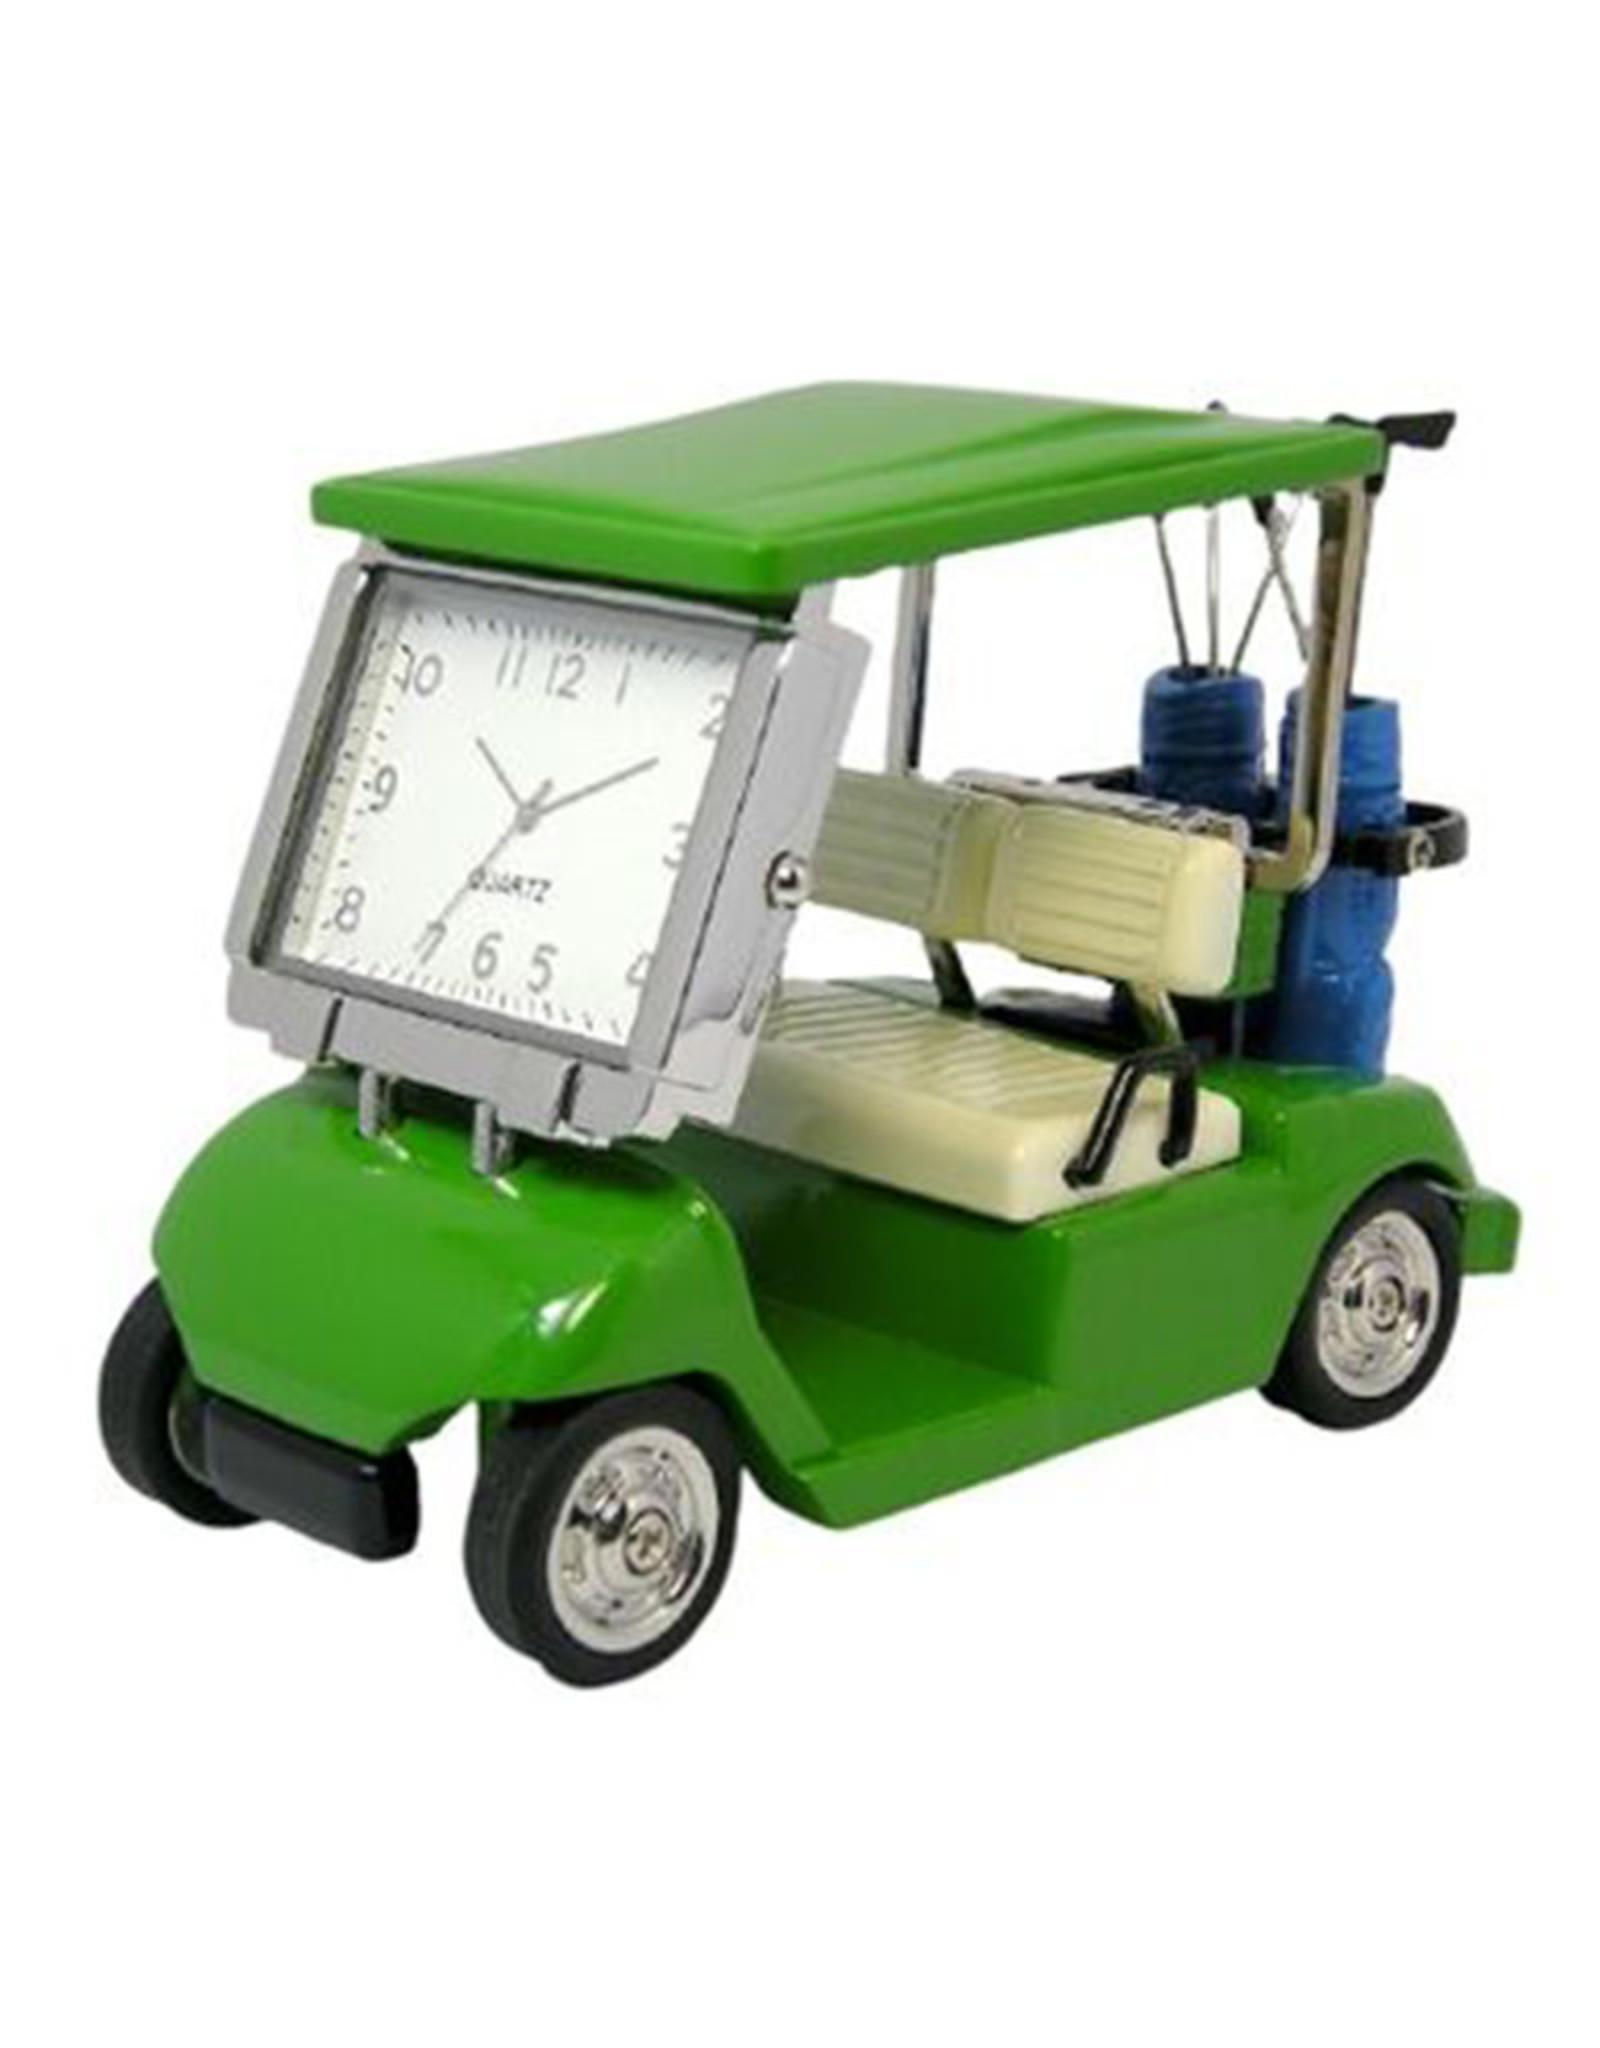 SANIS GREEN GOLF CART MINIATURE CLOCK